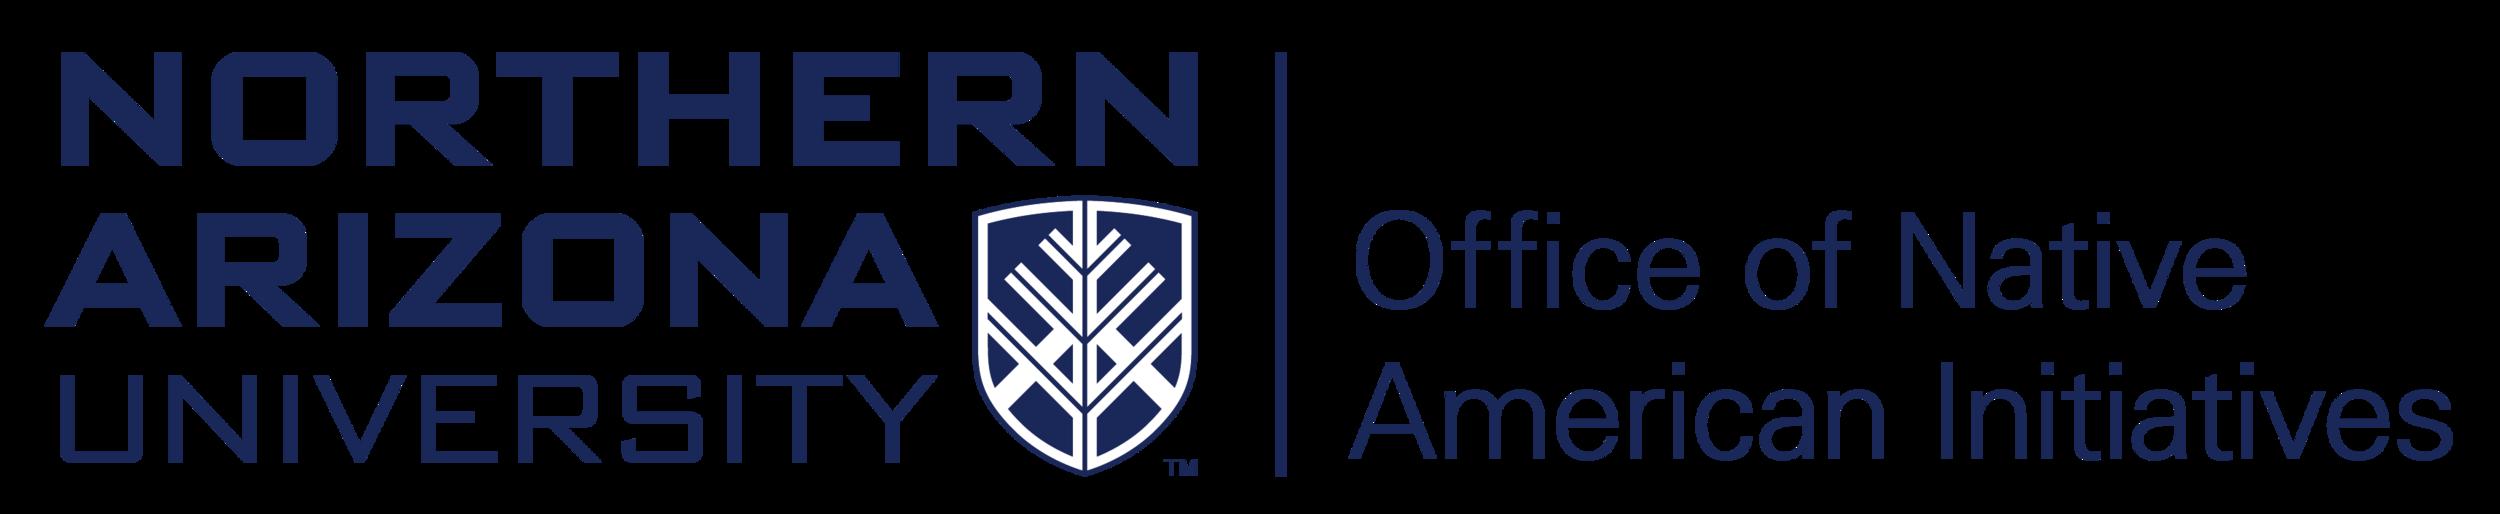 NAU Logos_Office of Native American   Initiatives-PRIM-281.png